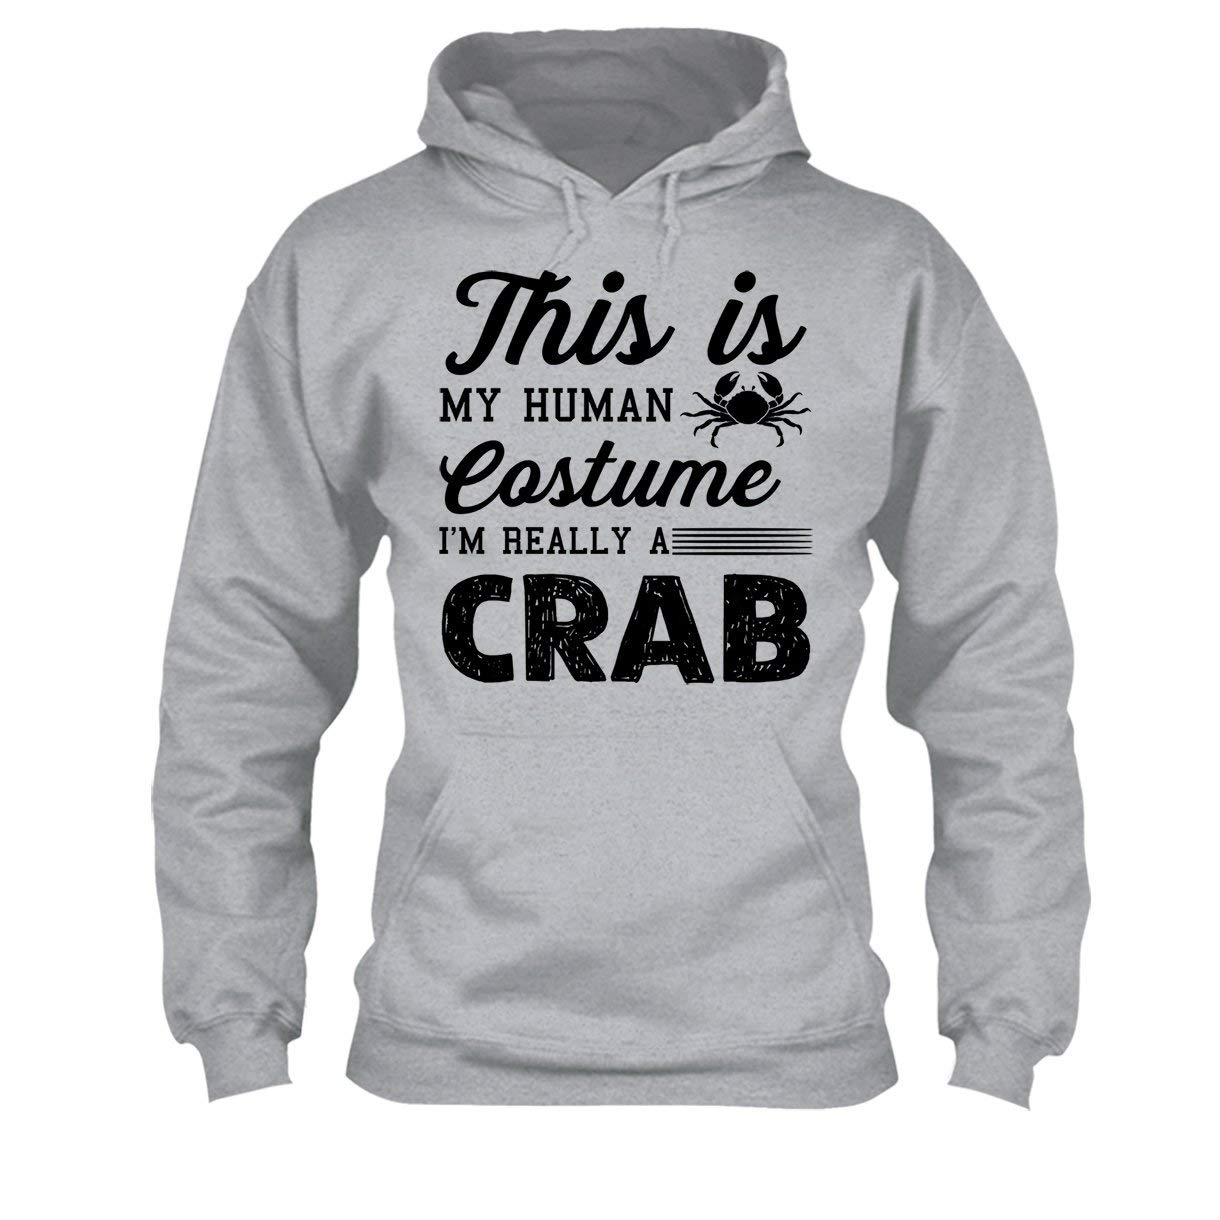 Hoodies Shirt Im Really A Crab Tee Shirt